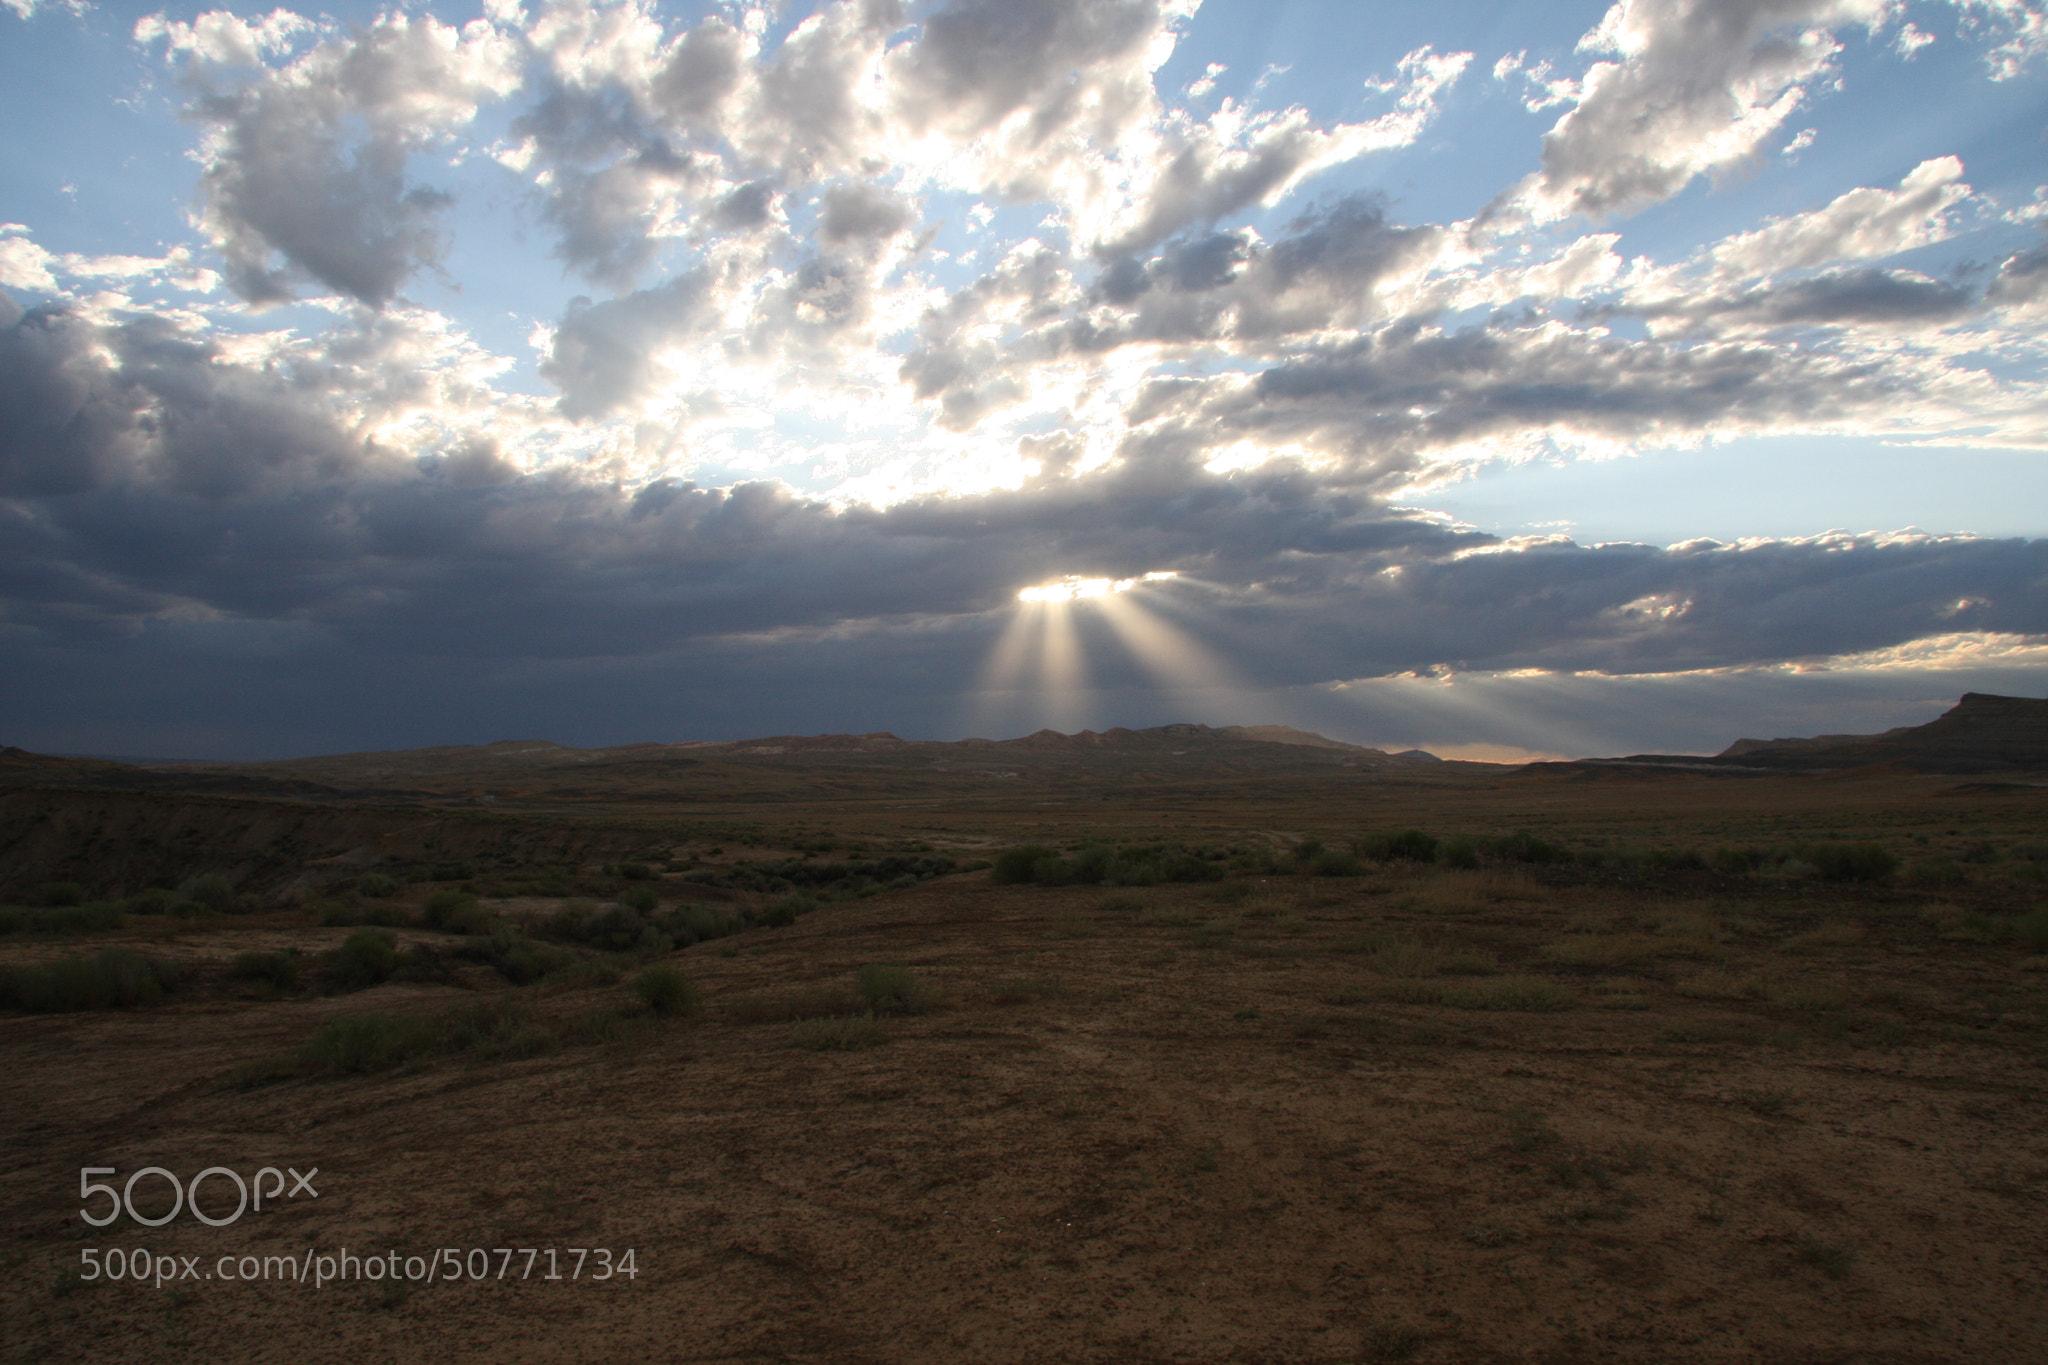 Photograph Beautiful Nature by Tashina van Zwam on 500px